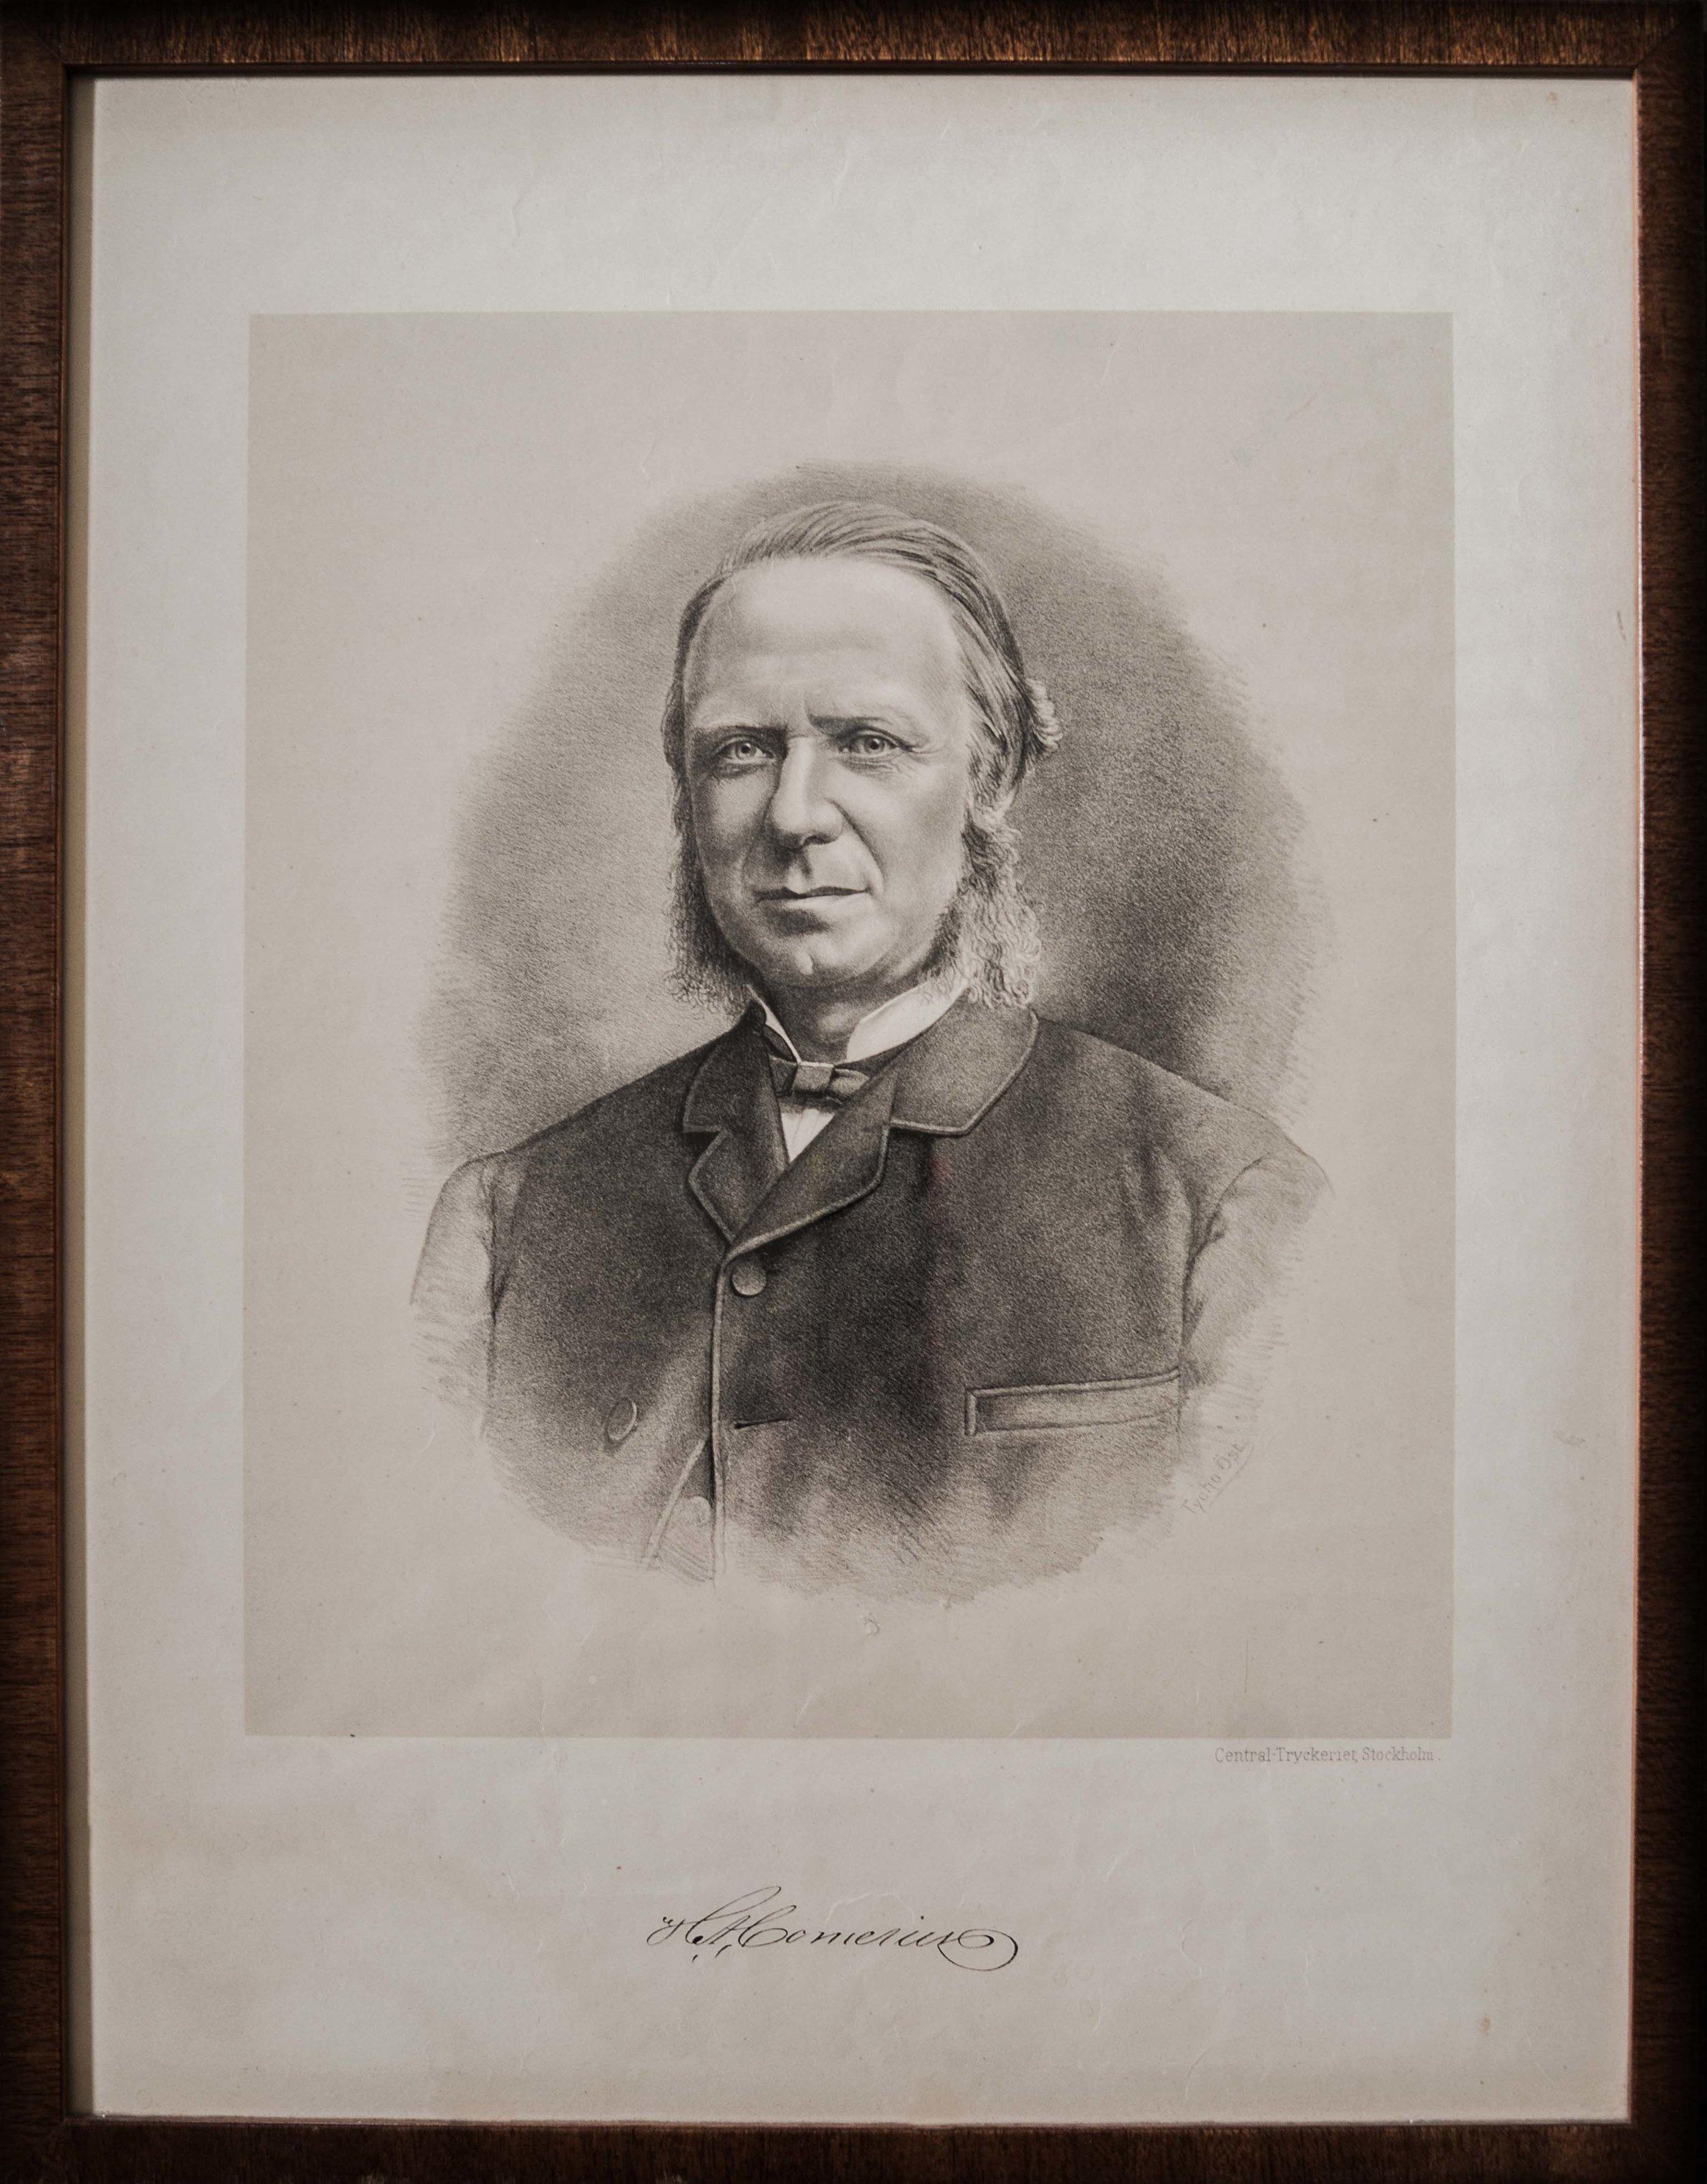 August Hampus Cornelius. Entrepreneur, dubbad riddare i Gustav Vasa Ordern